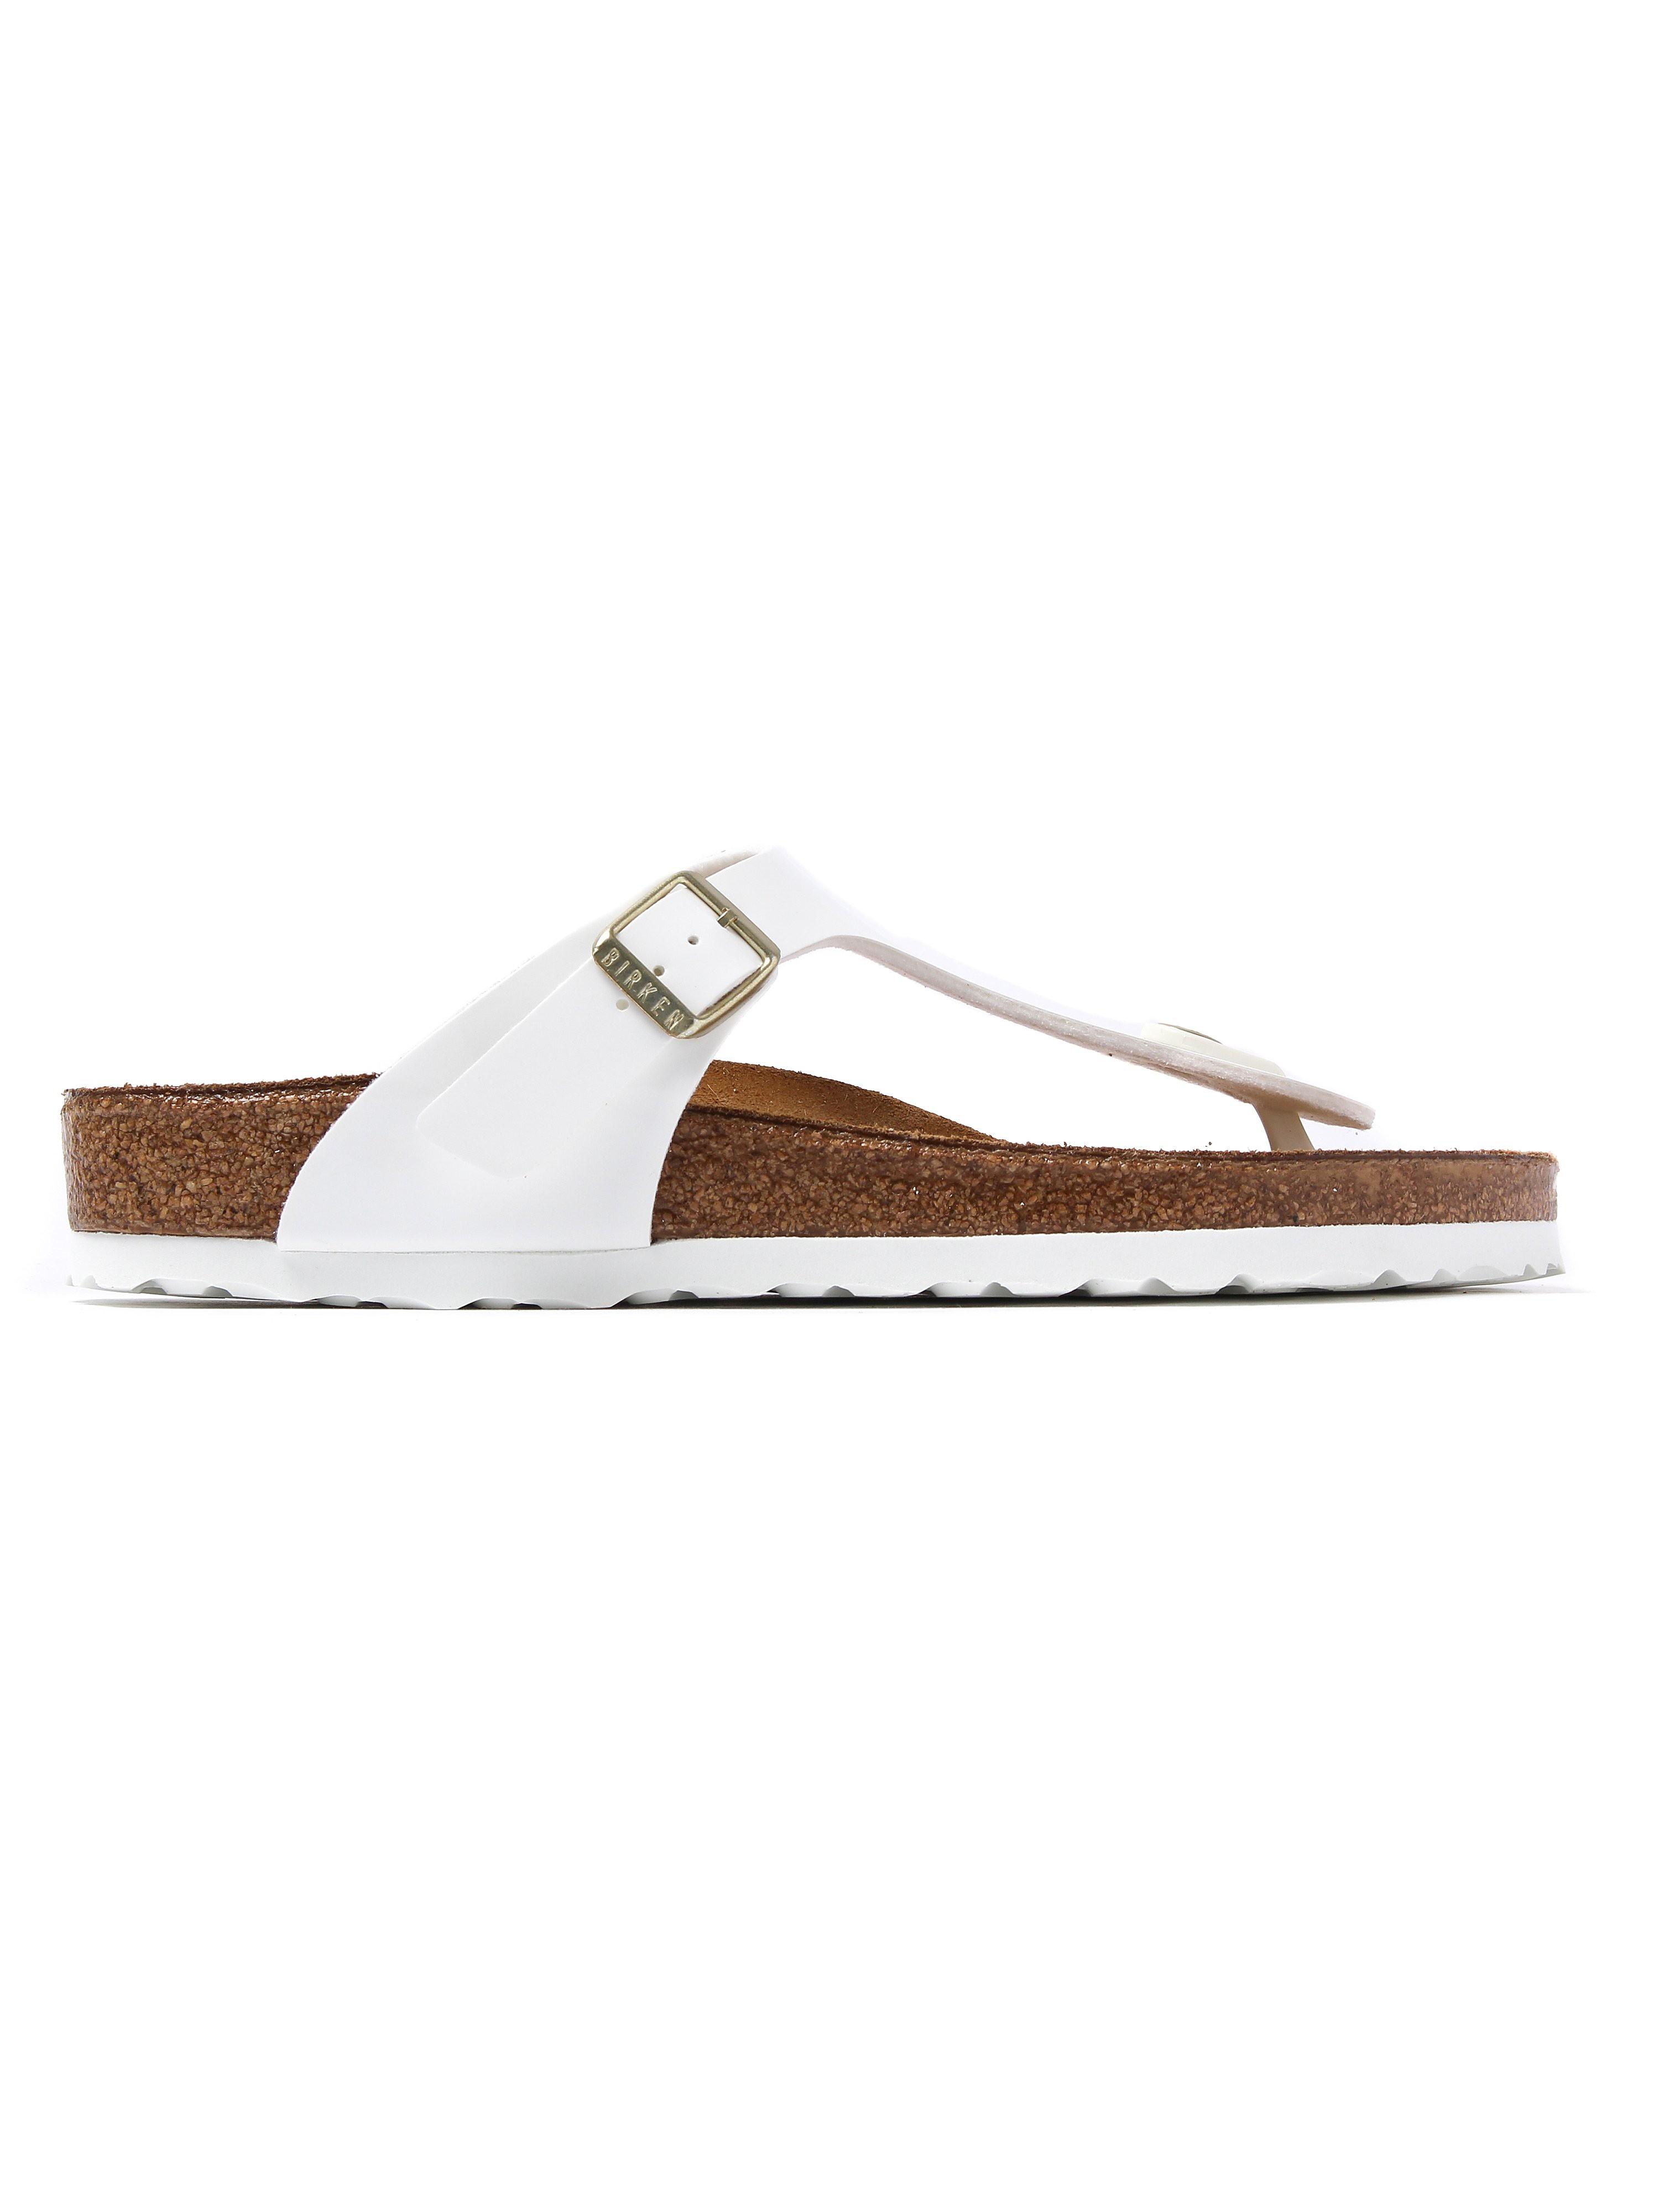 Birkenstock Women's Gizeh Regular Fit Sandals - White Patent